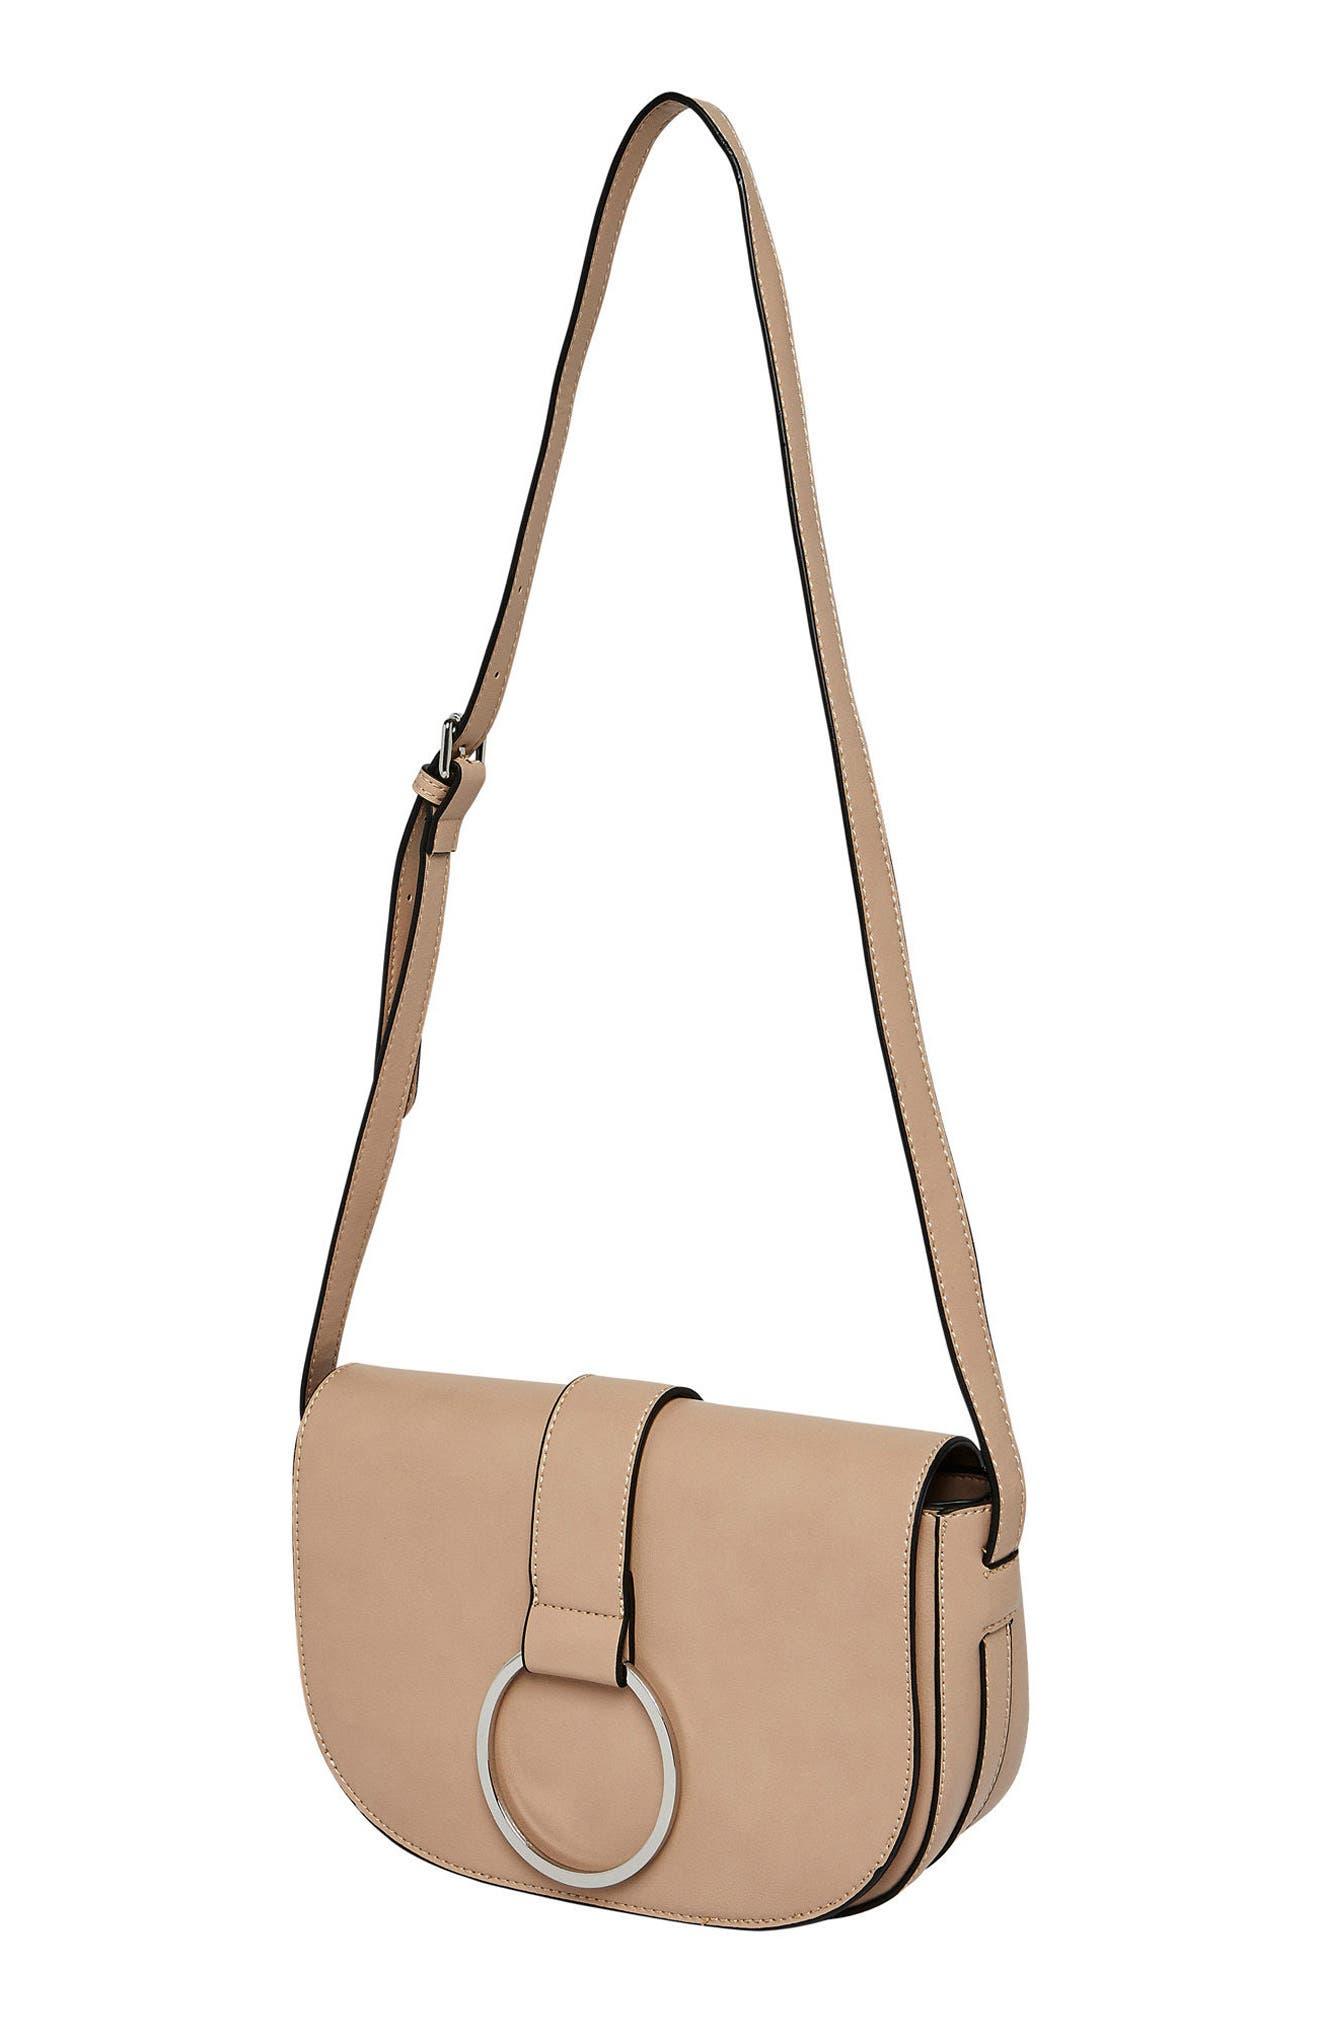 Lola Vegan Leather Crossbody Saddle Bag,                             Alternate thumbnail 3, color,                             PINK